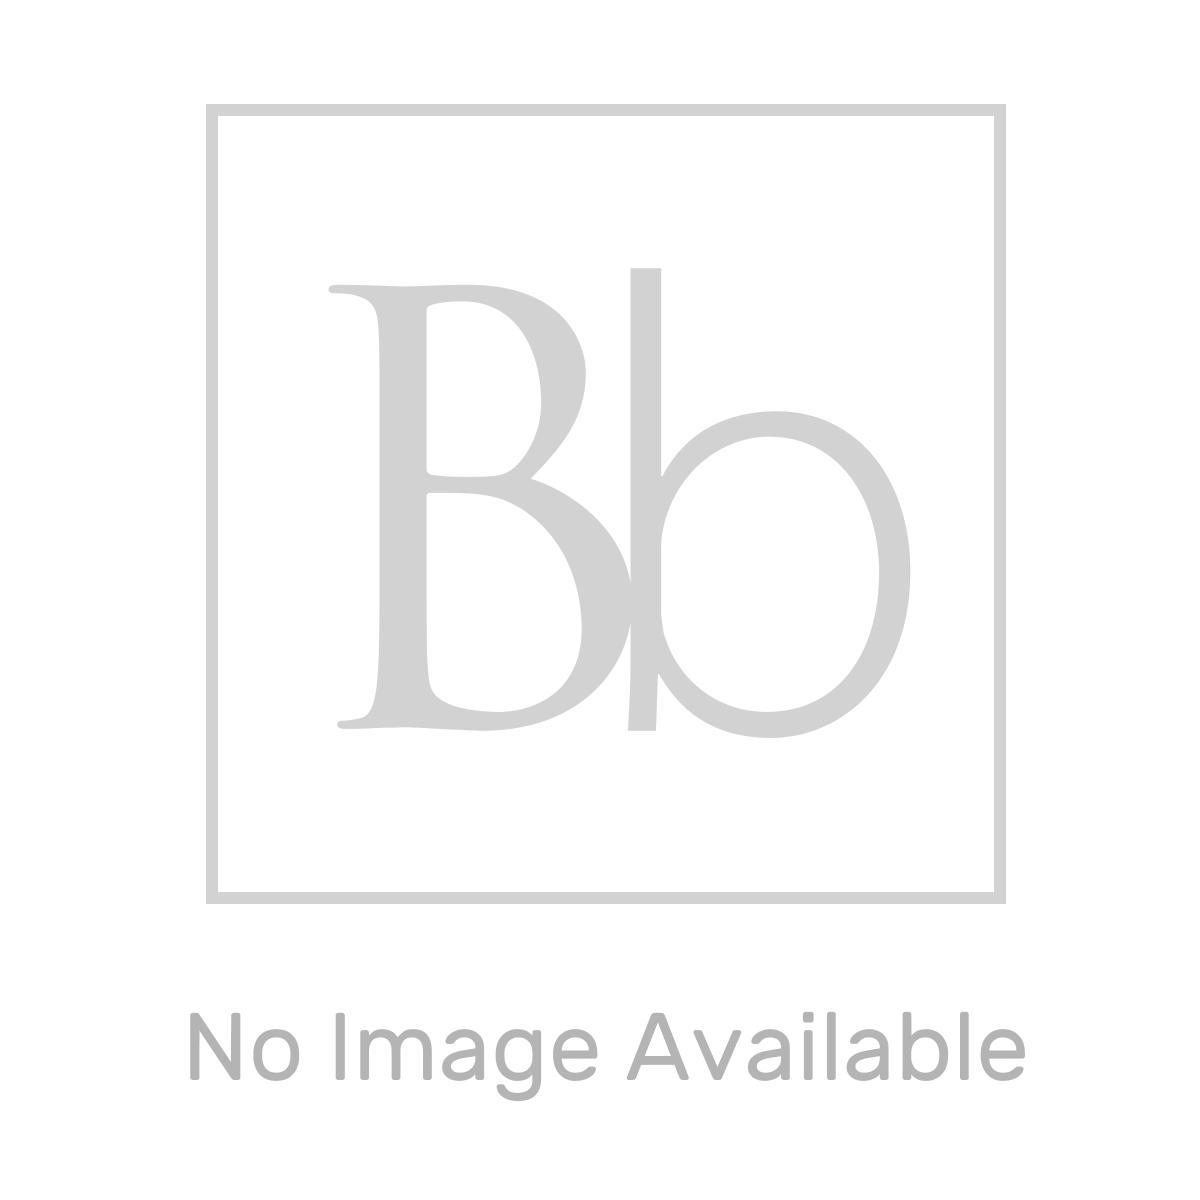 Kartell Purity Grey Ash 2 Drawer Floor Standing Vanity Unit 600mm Lifestyle